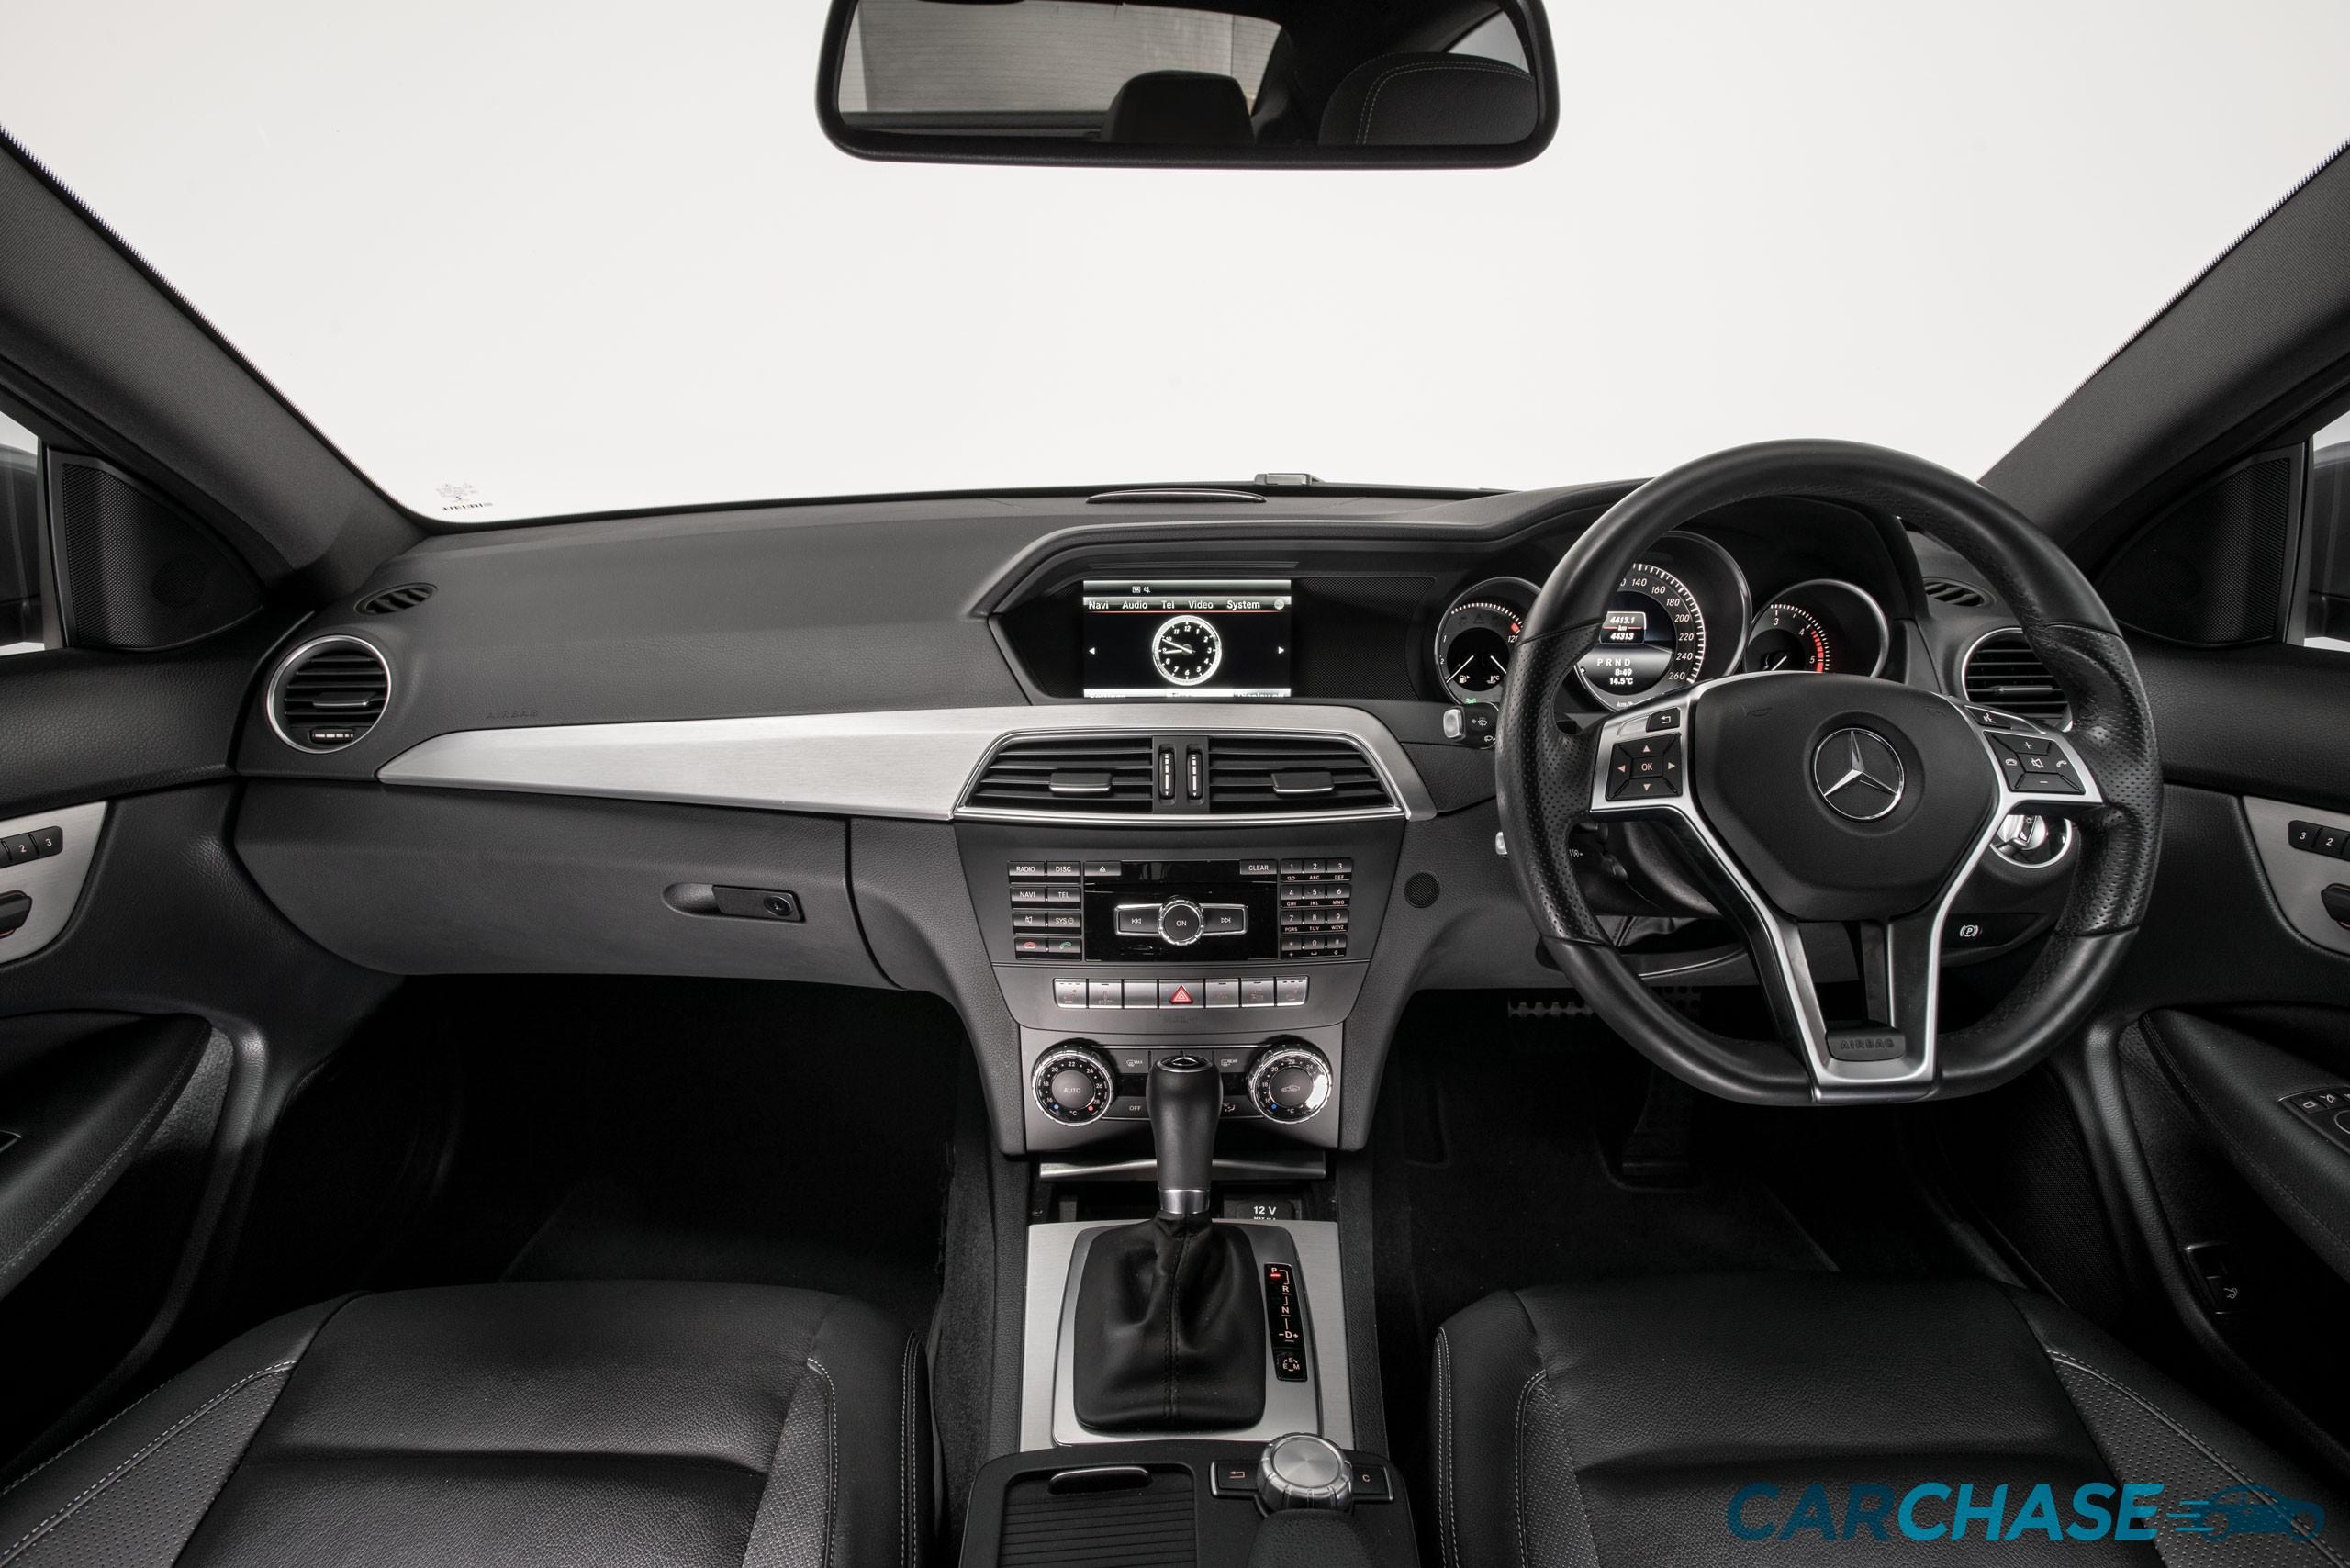 Image of dashboard profile of 2015 Mercedes-Benz C250 CDi Avantgarde